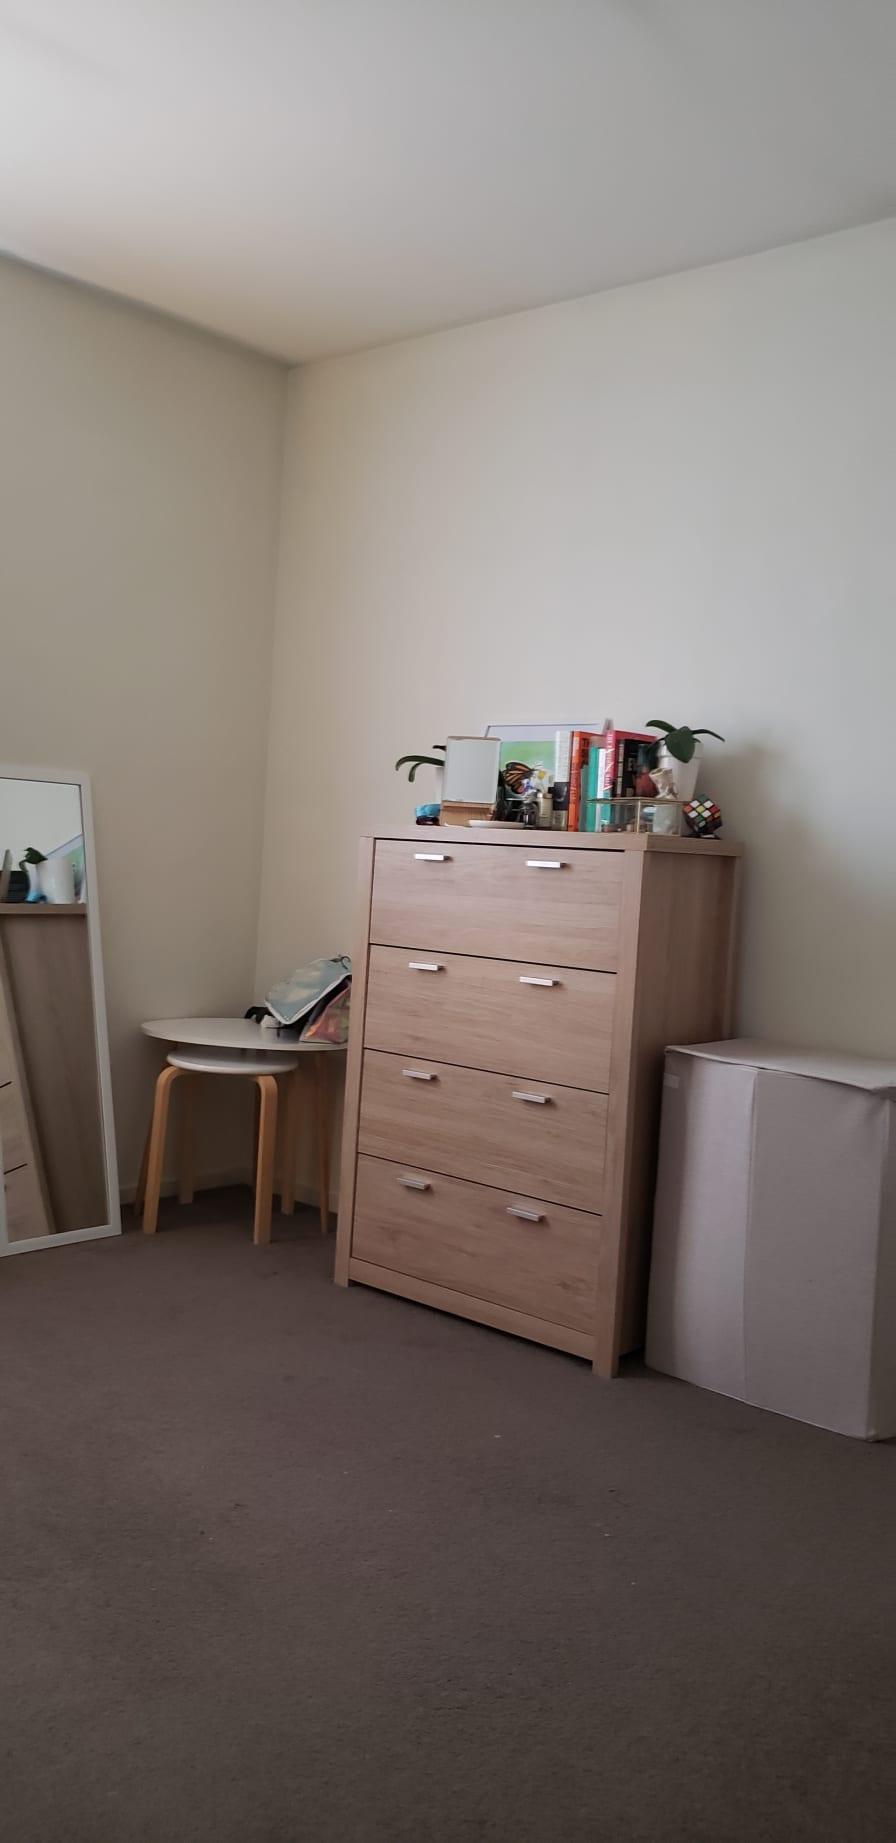 Photo of Angelica CG's room